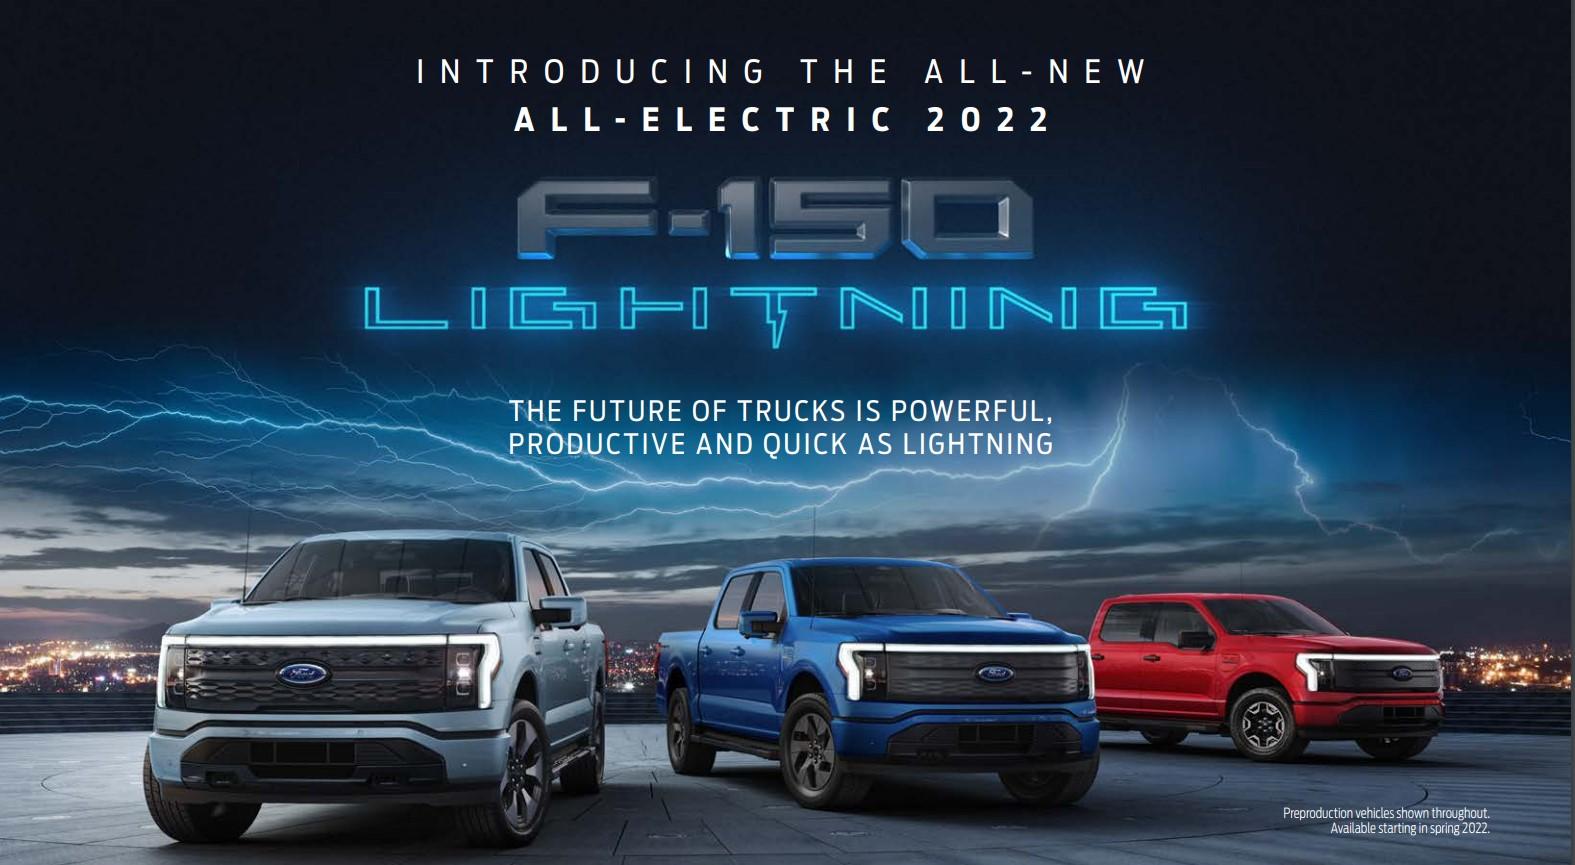 2022 Ford F-150 Lightning savings over gas model York Region- Toronto EV car Dealer